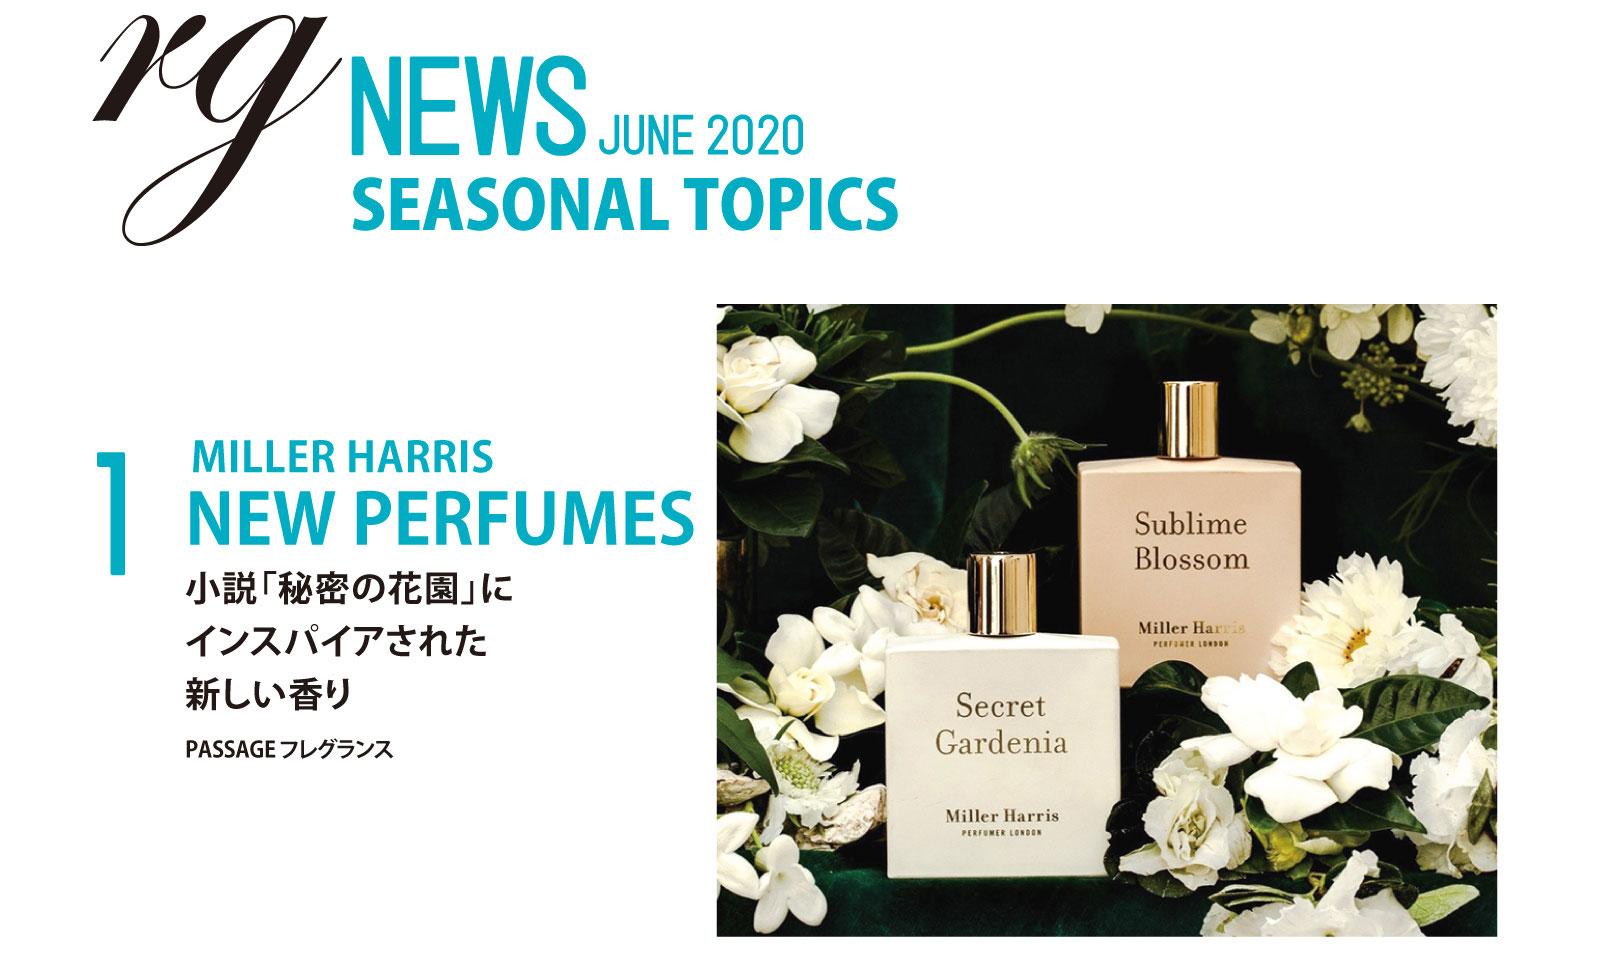 MILLER HARRIS 「秘密の花園」にインスパイアされた新しい香り